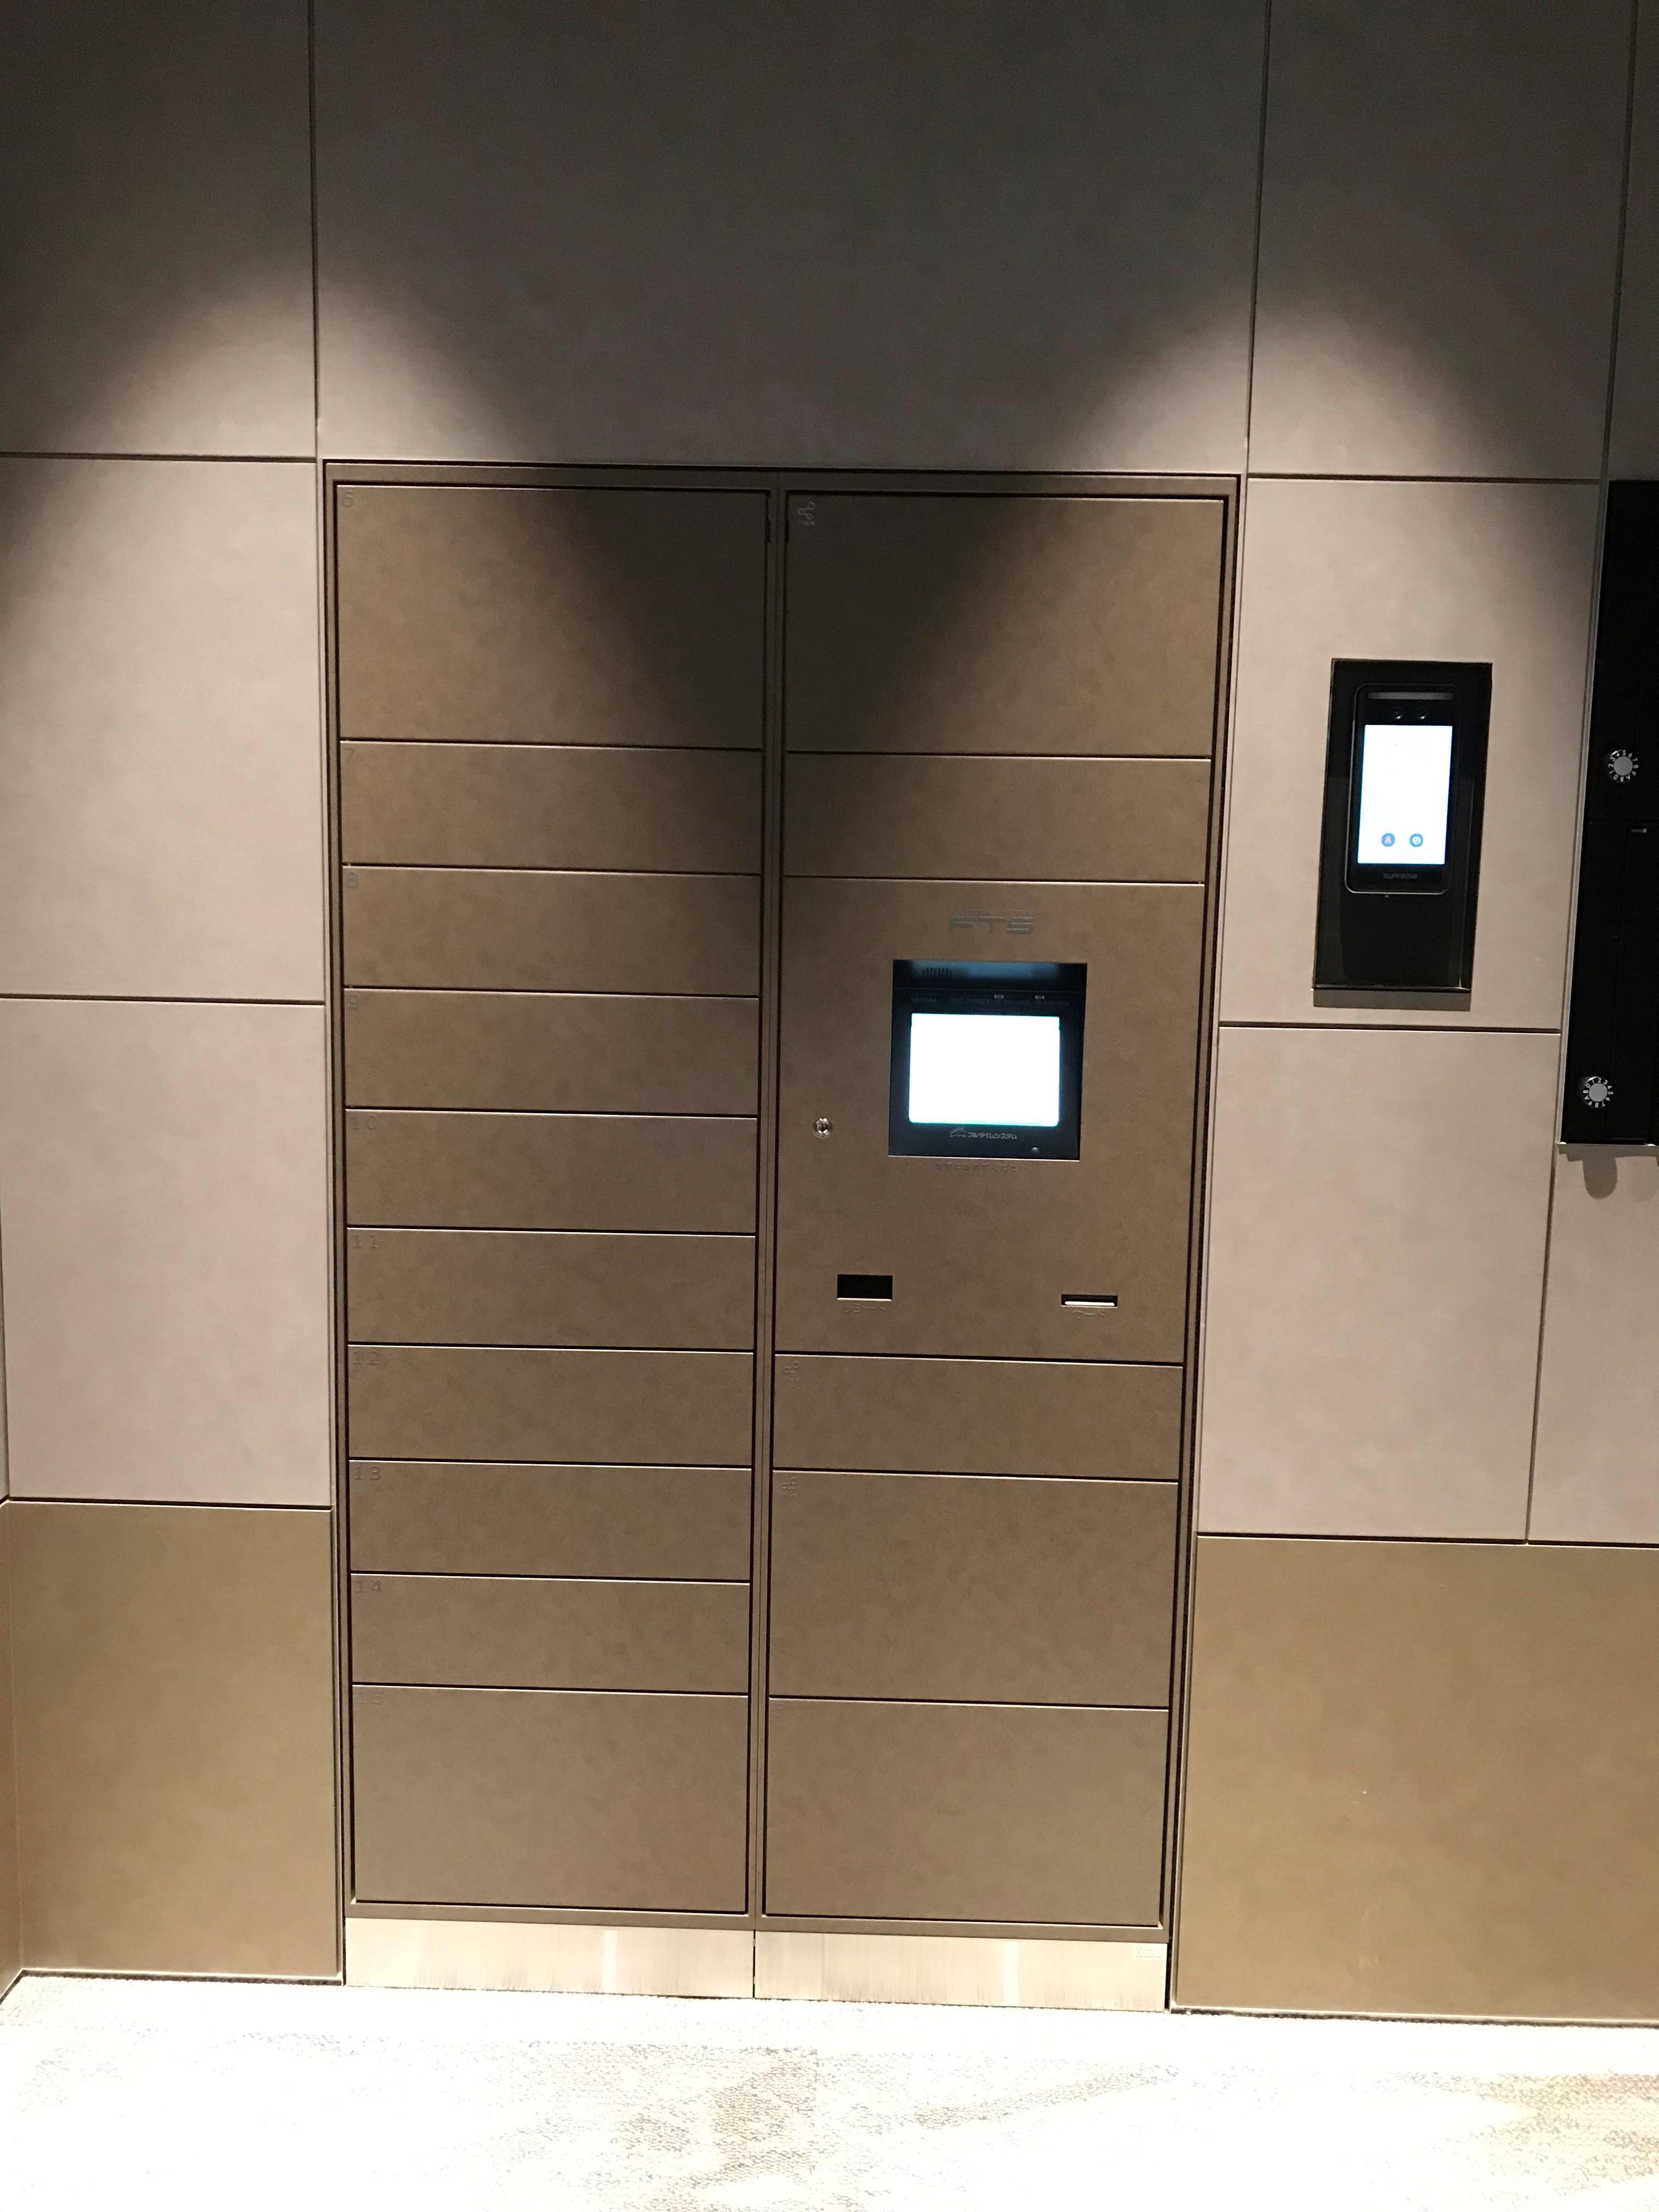 ・H1O 虎ノ門 (東京都港区虎ノ門一丁目3 番1) 2021 年1 月開業